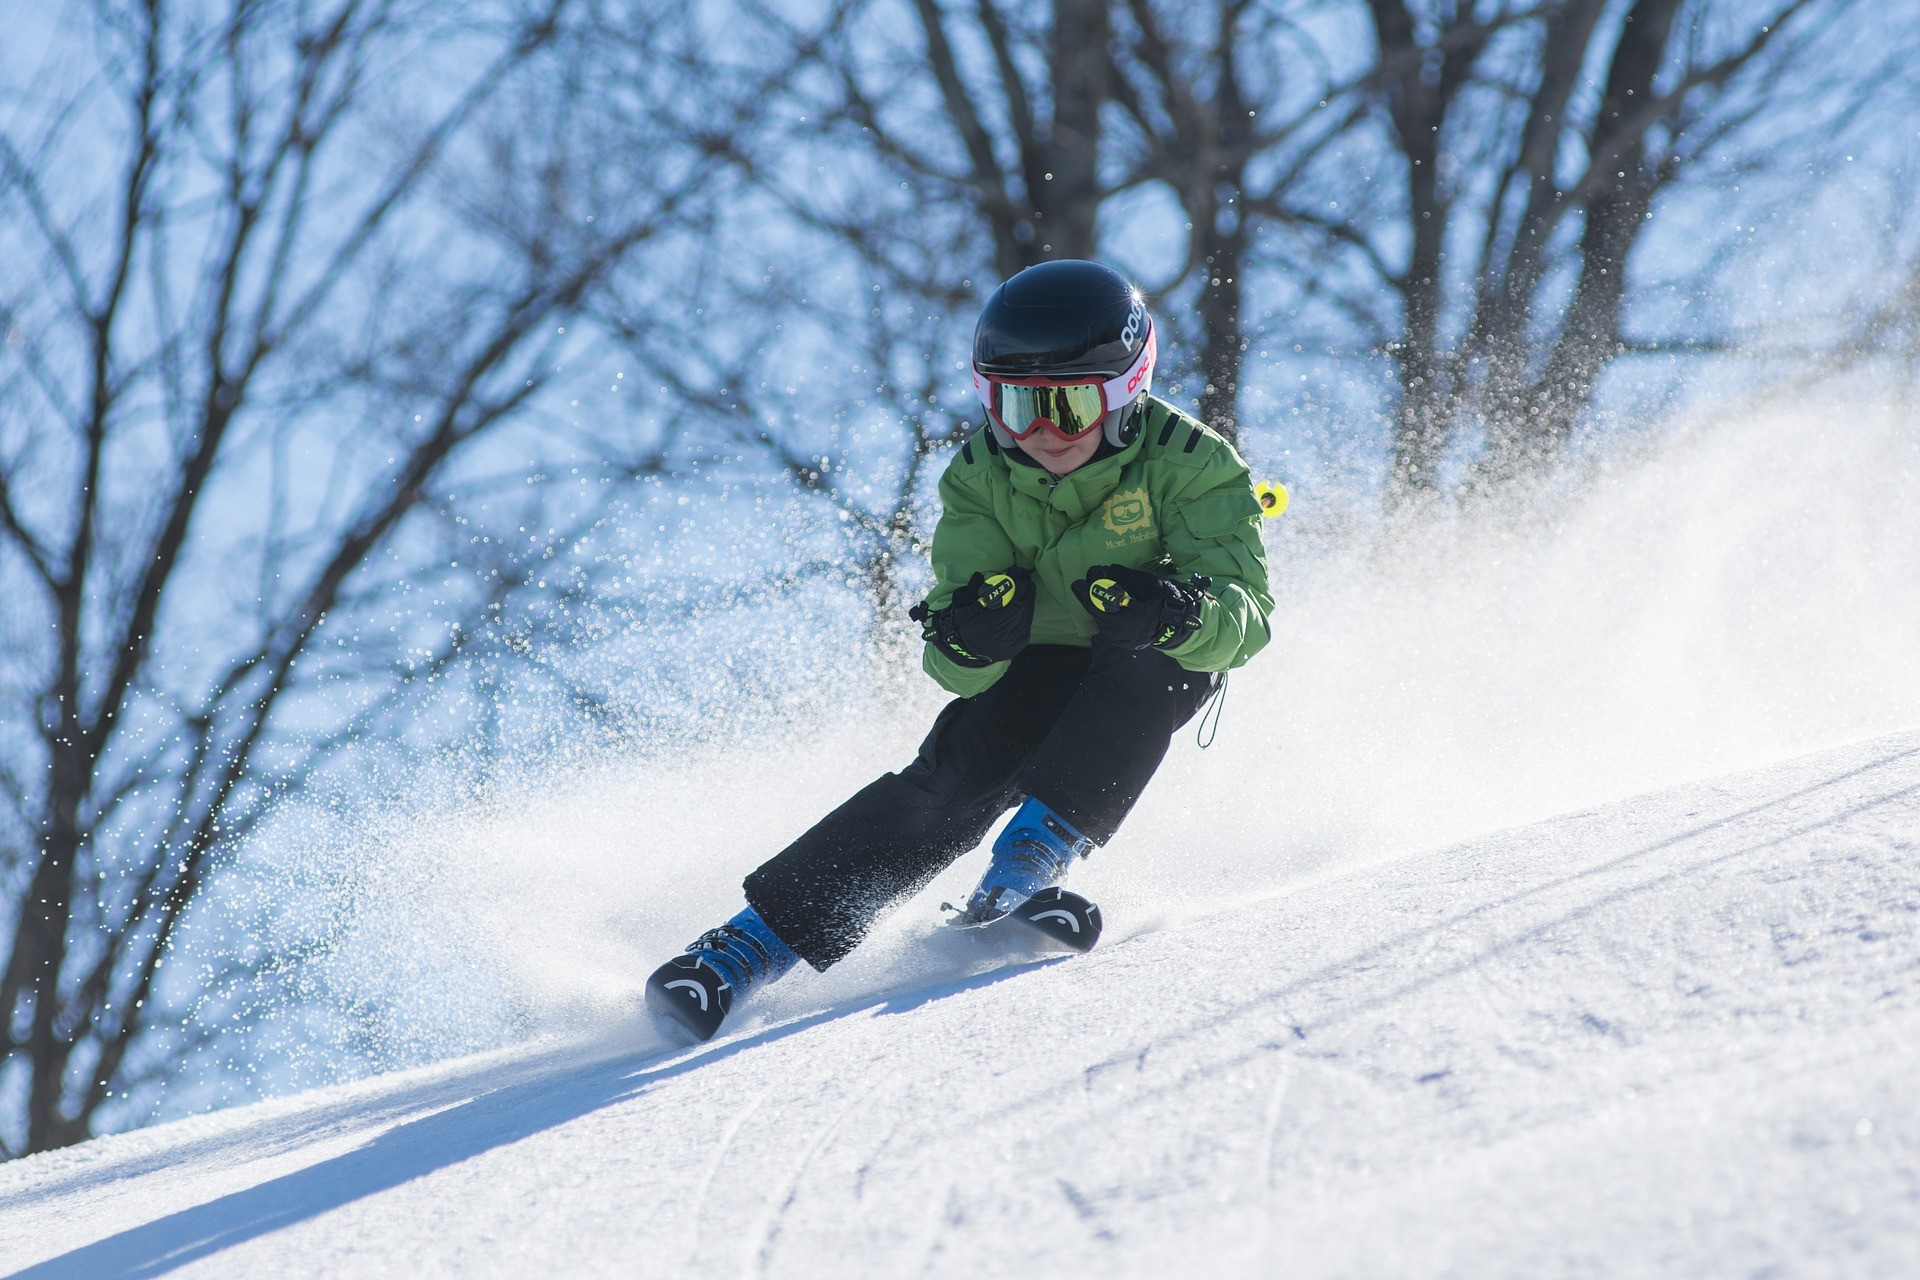 Learn to Ski in Slovakia: Skiing in the Tatra Mountains